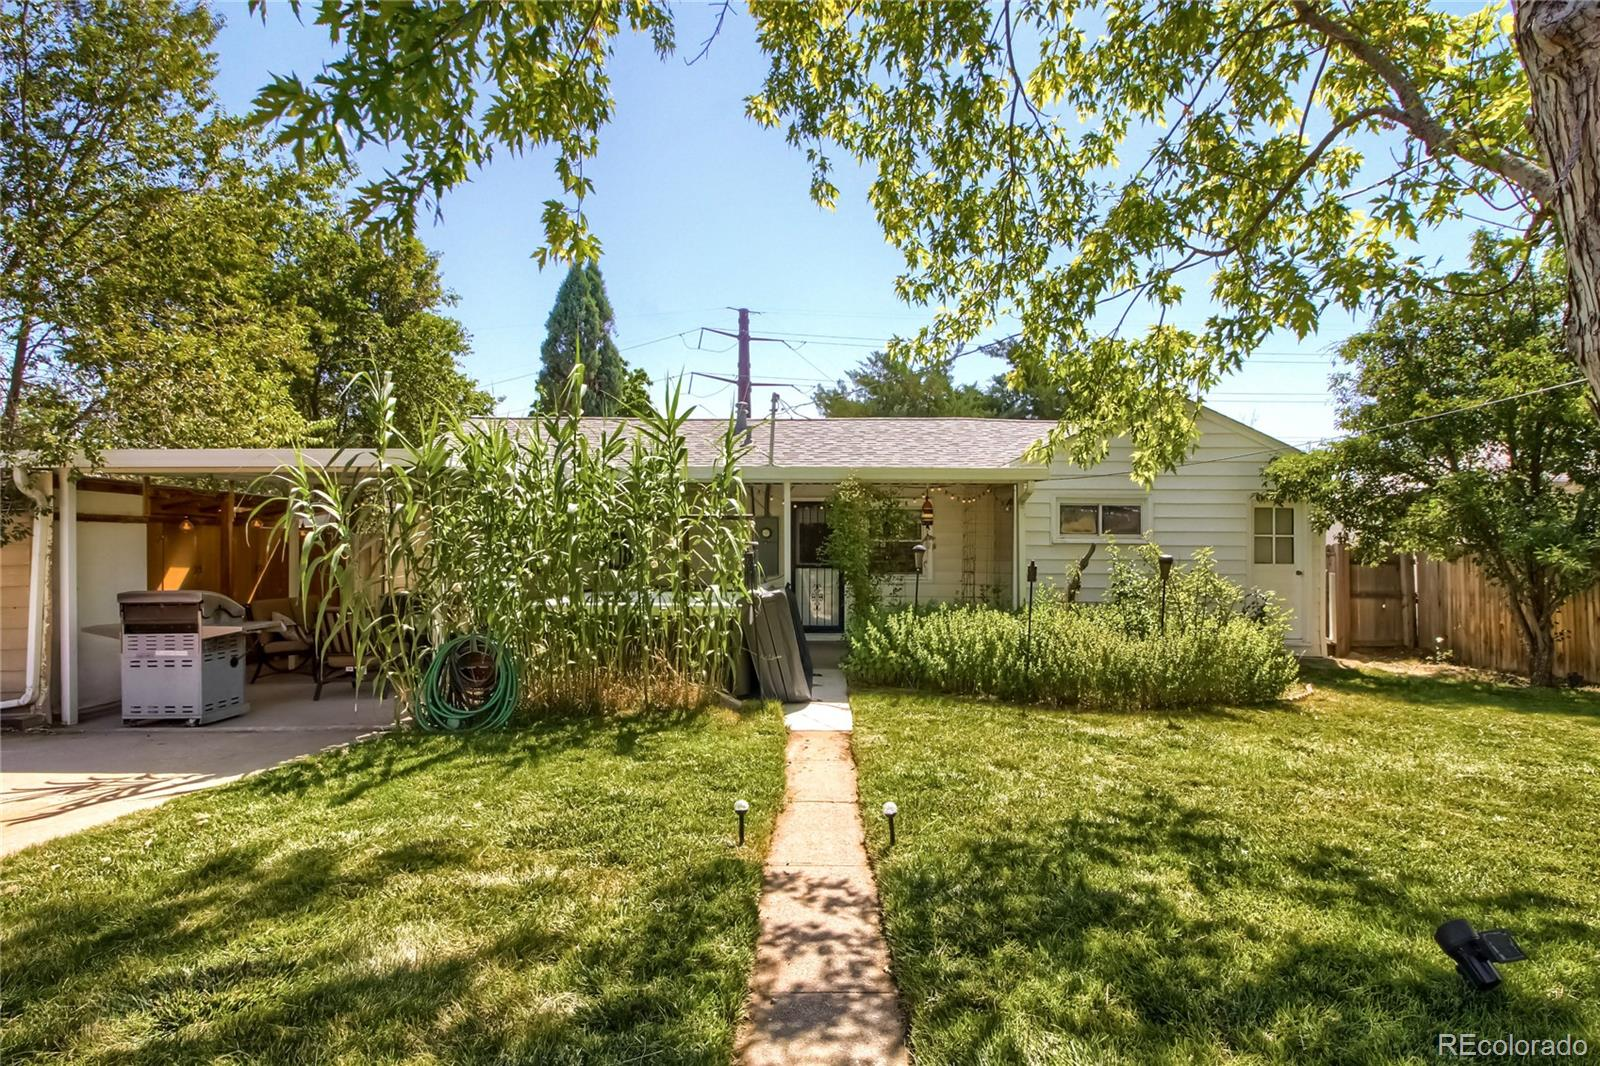 MLS# 6113287 - 35 - 1269 S Quivas Street, Denver, CO 80223